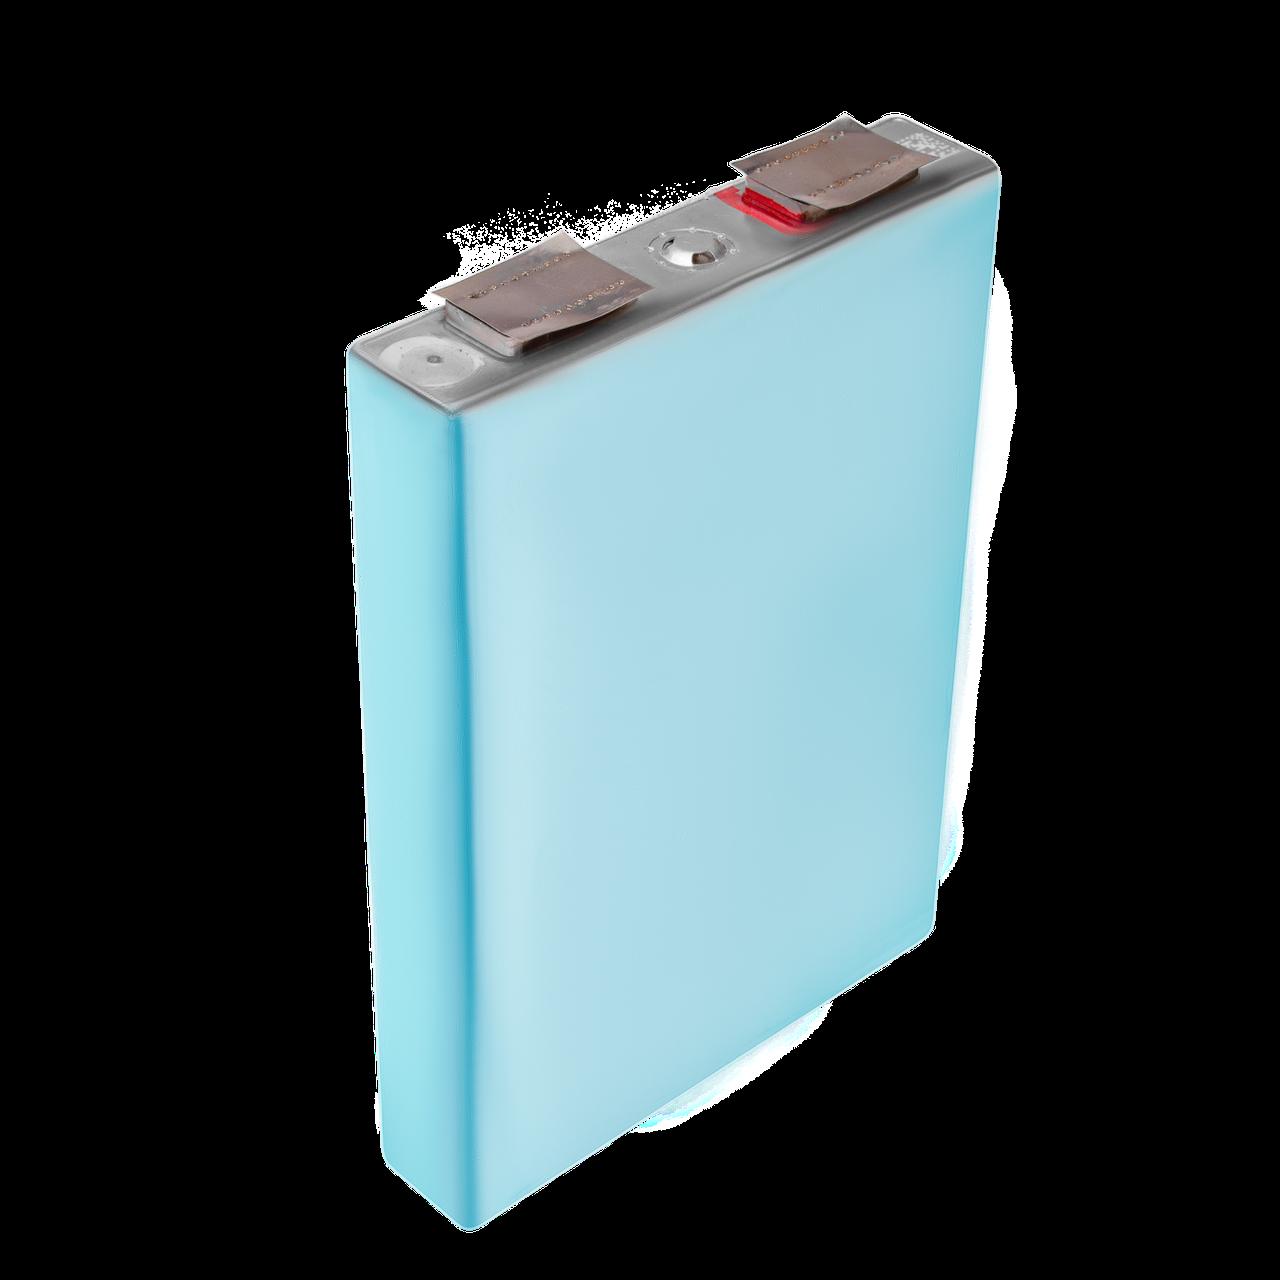 Аккумулятор Литий-ионный Lifepo4 30AH 3.2v (Guoxuan)